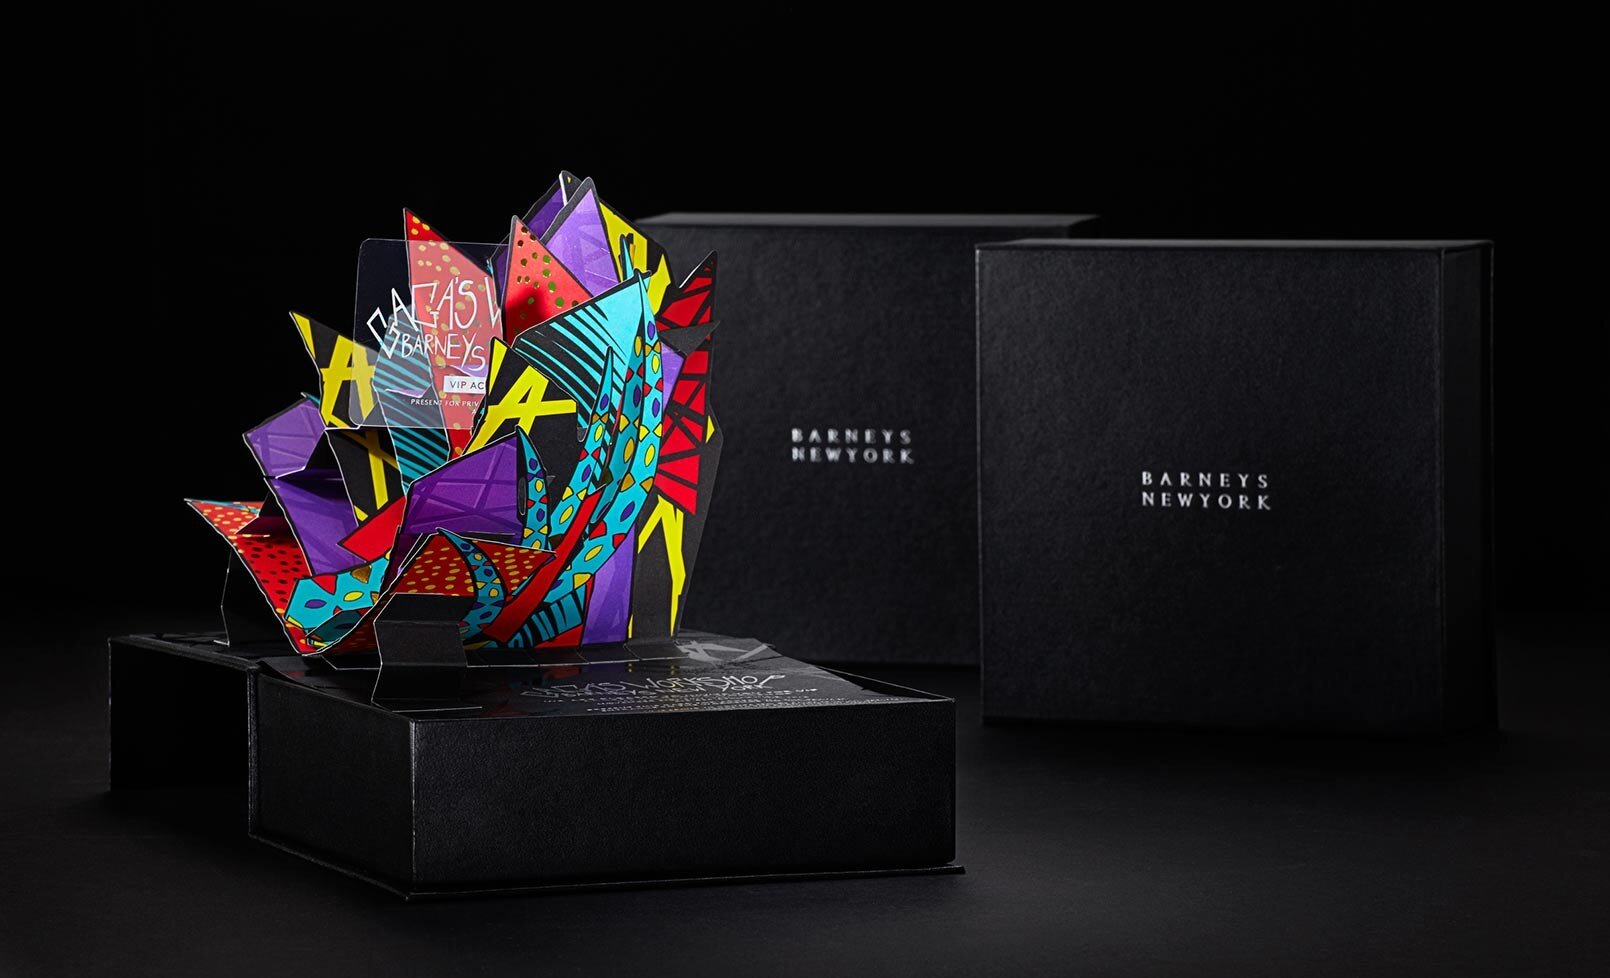 Barneys-New-York-Holiday-Lady-Gaga-Worskshop-Design-Packaging-Company-1-1610x978-1.jpg